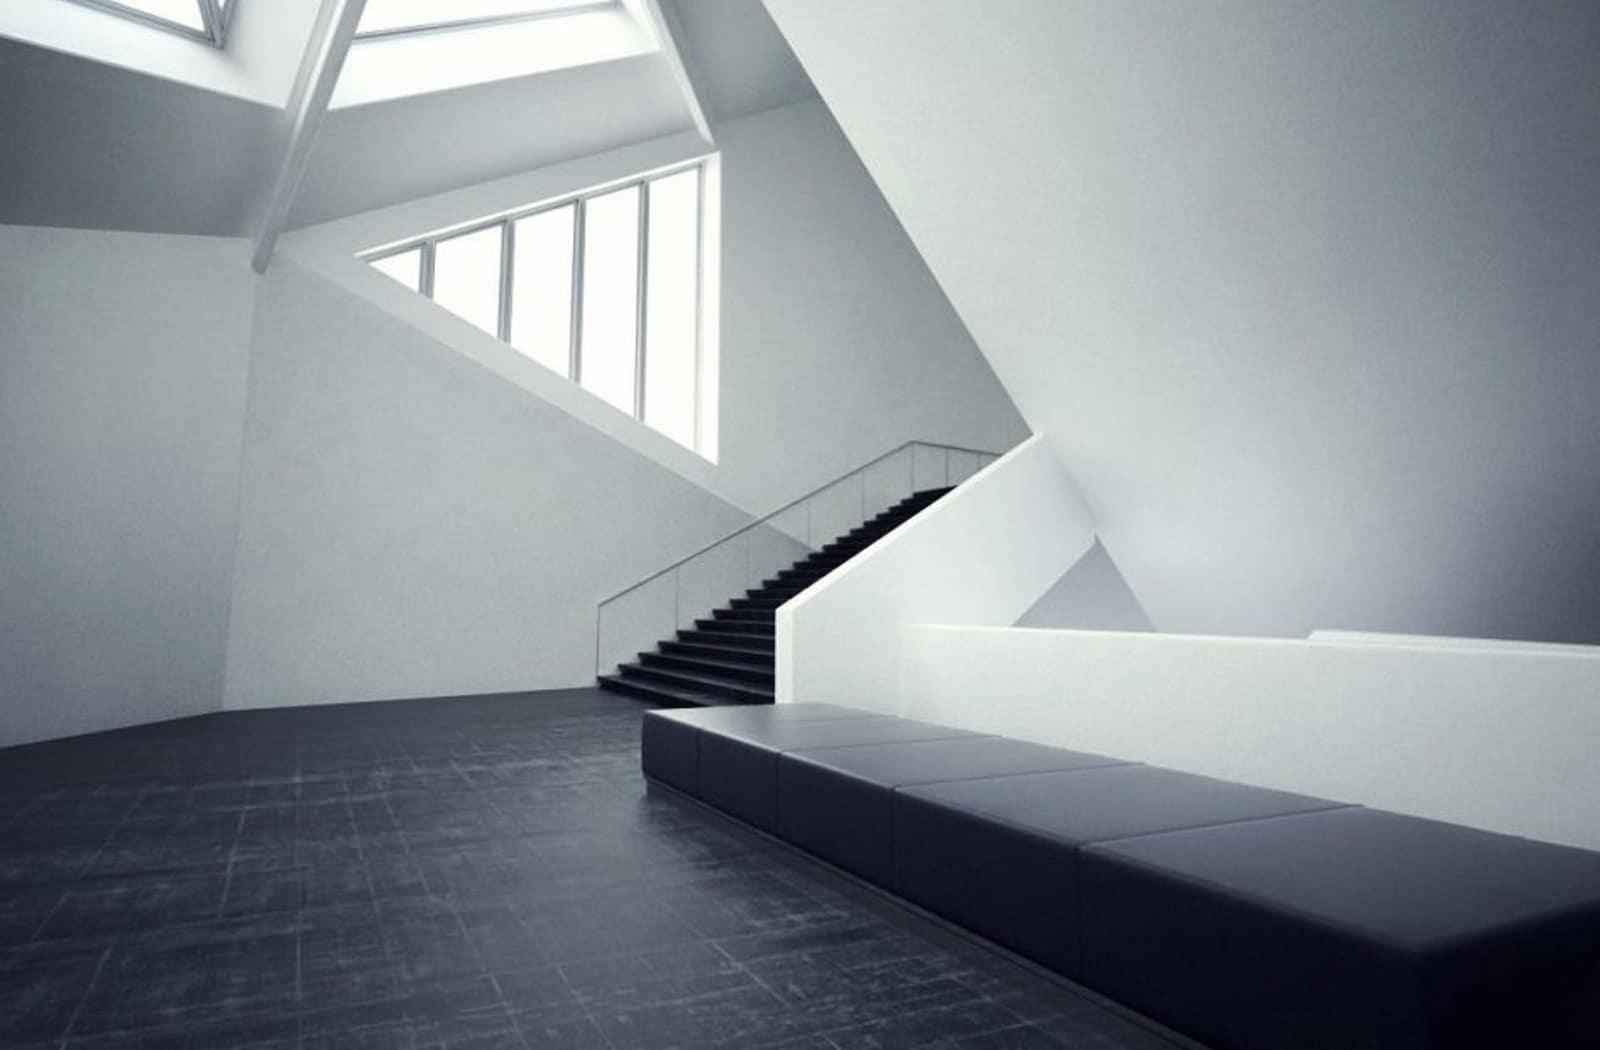 Virtual architecture master master in architettura 3d for Master architettura